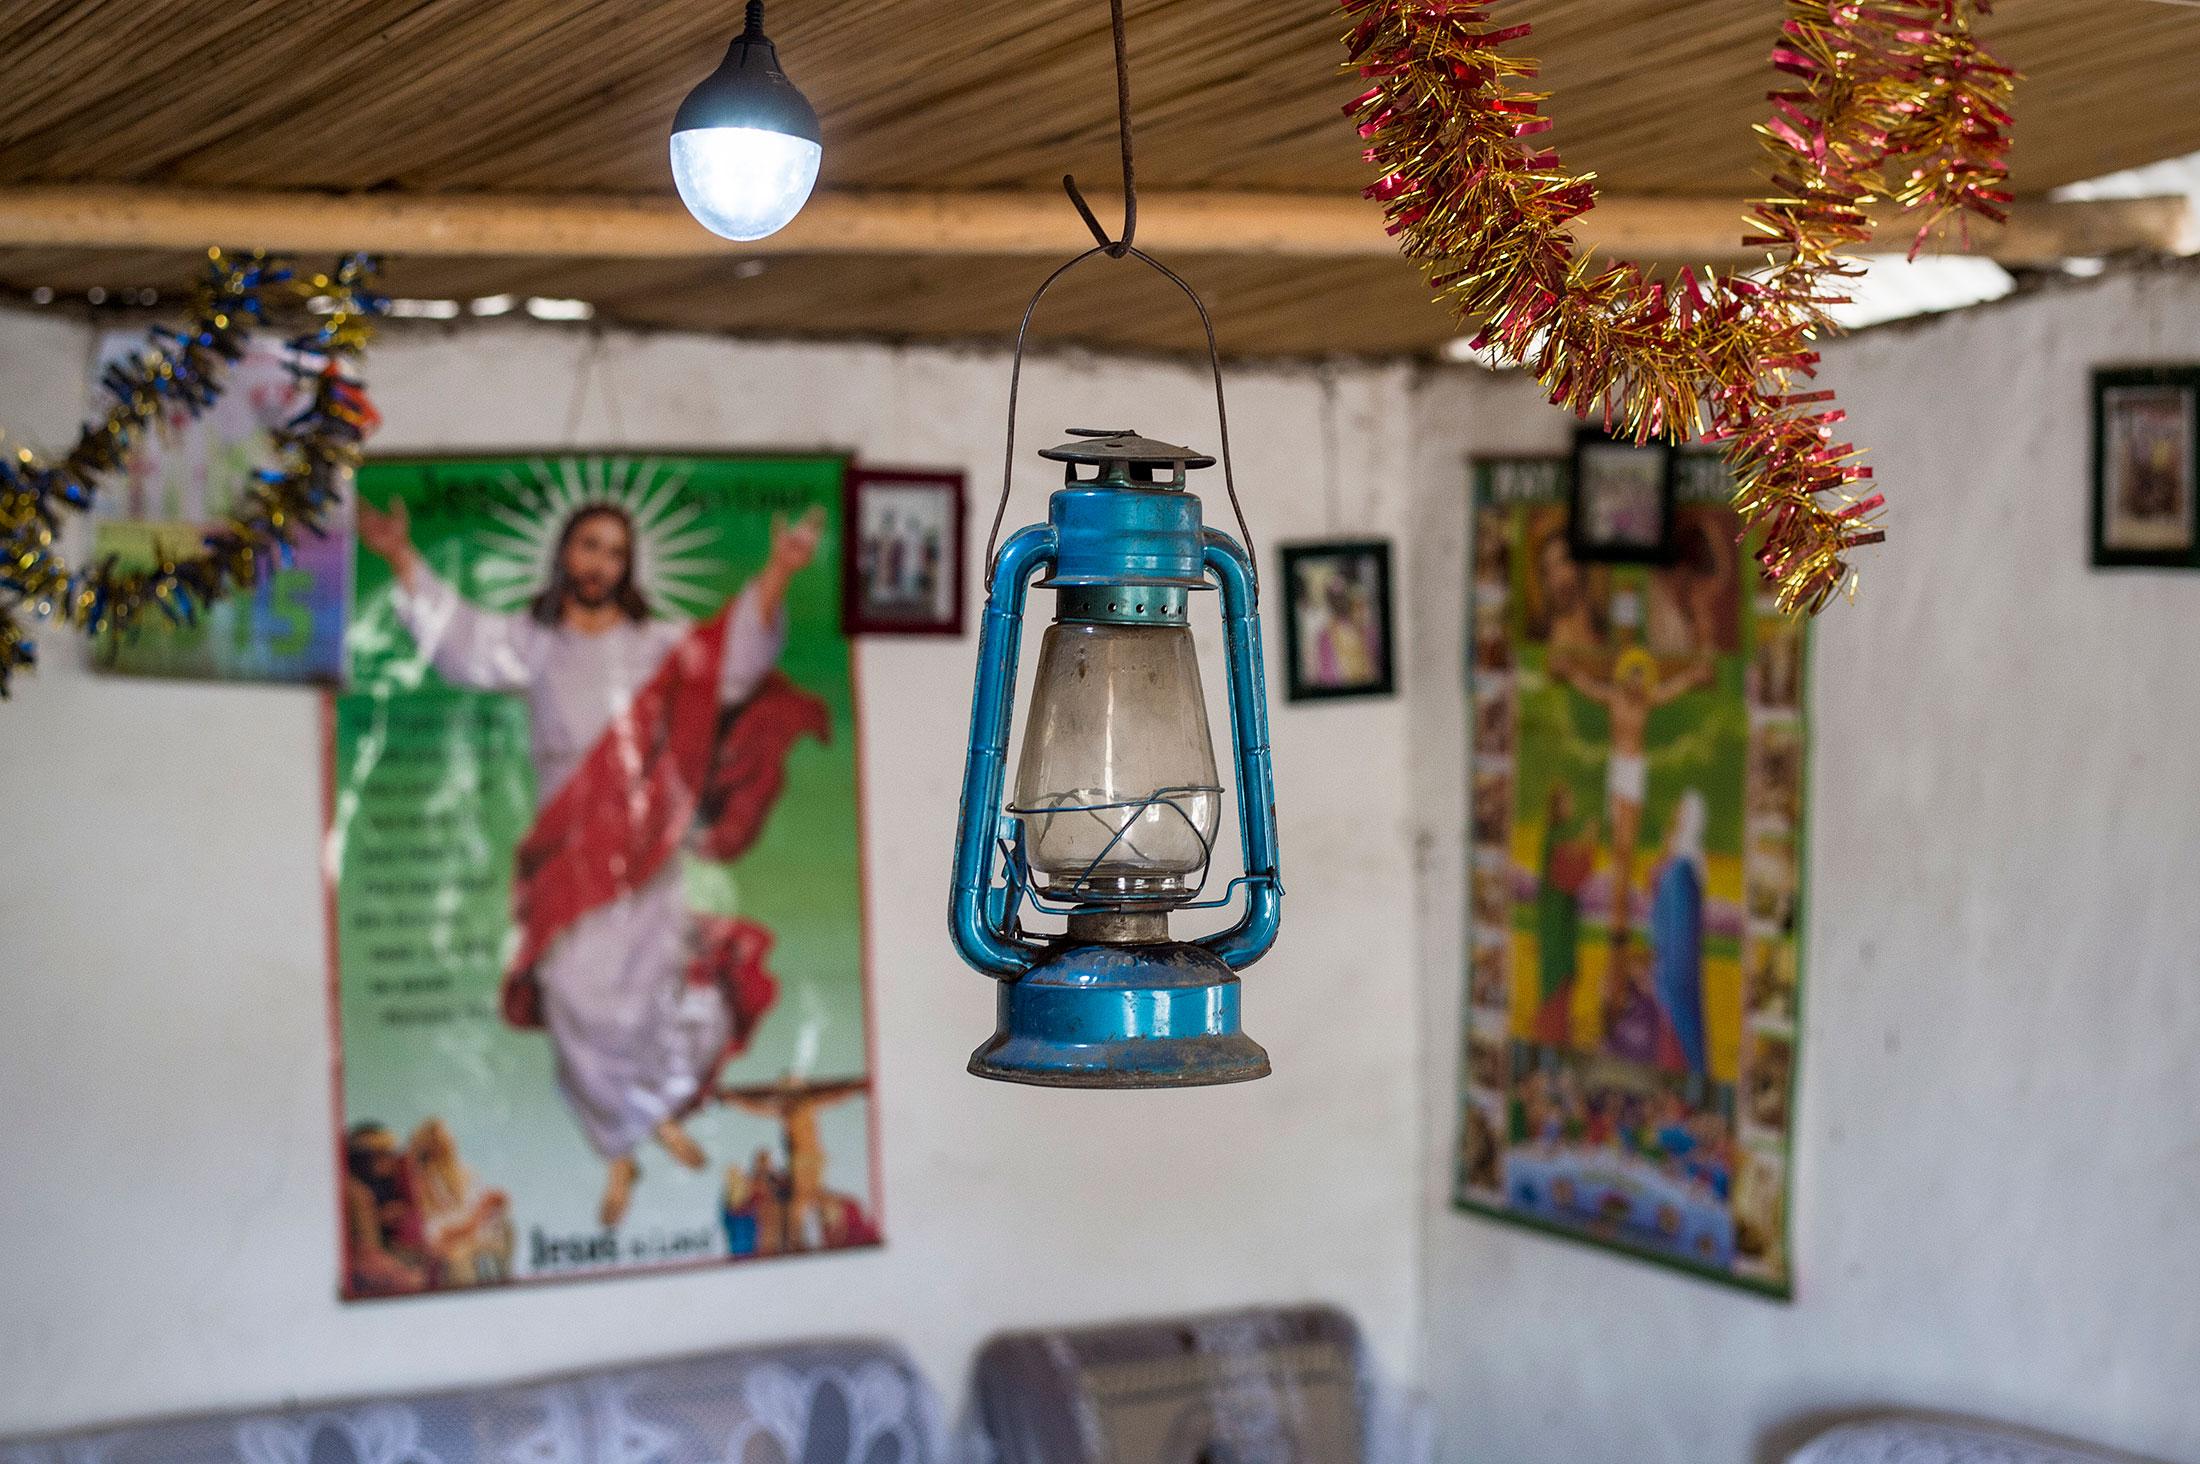 Before using solar lights, Atieno was using this kerosene lamp.